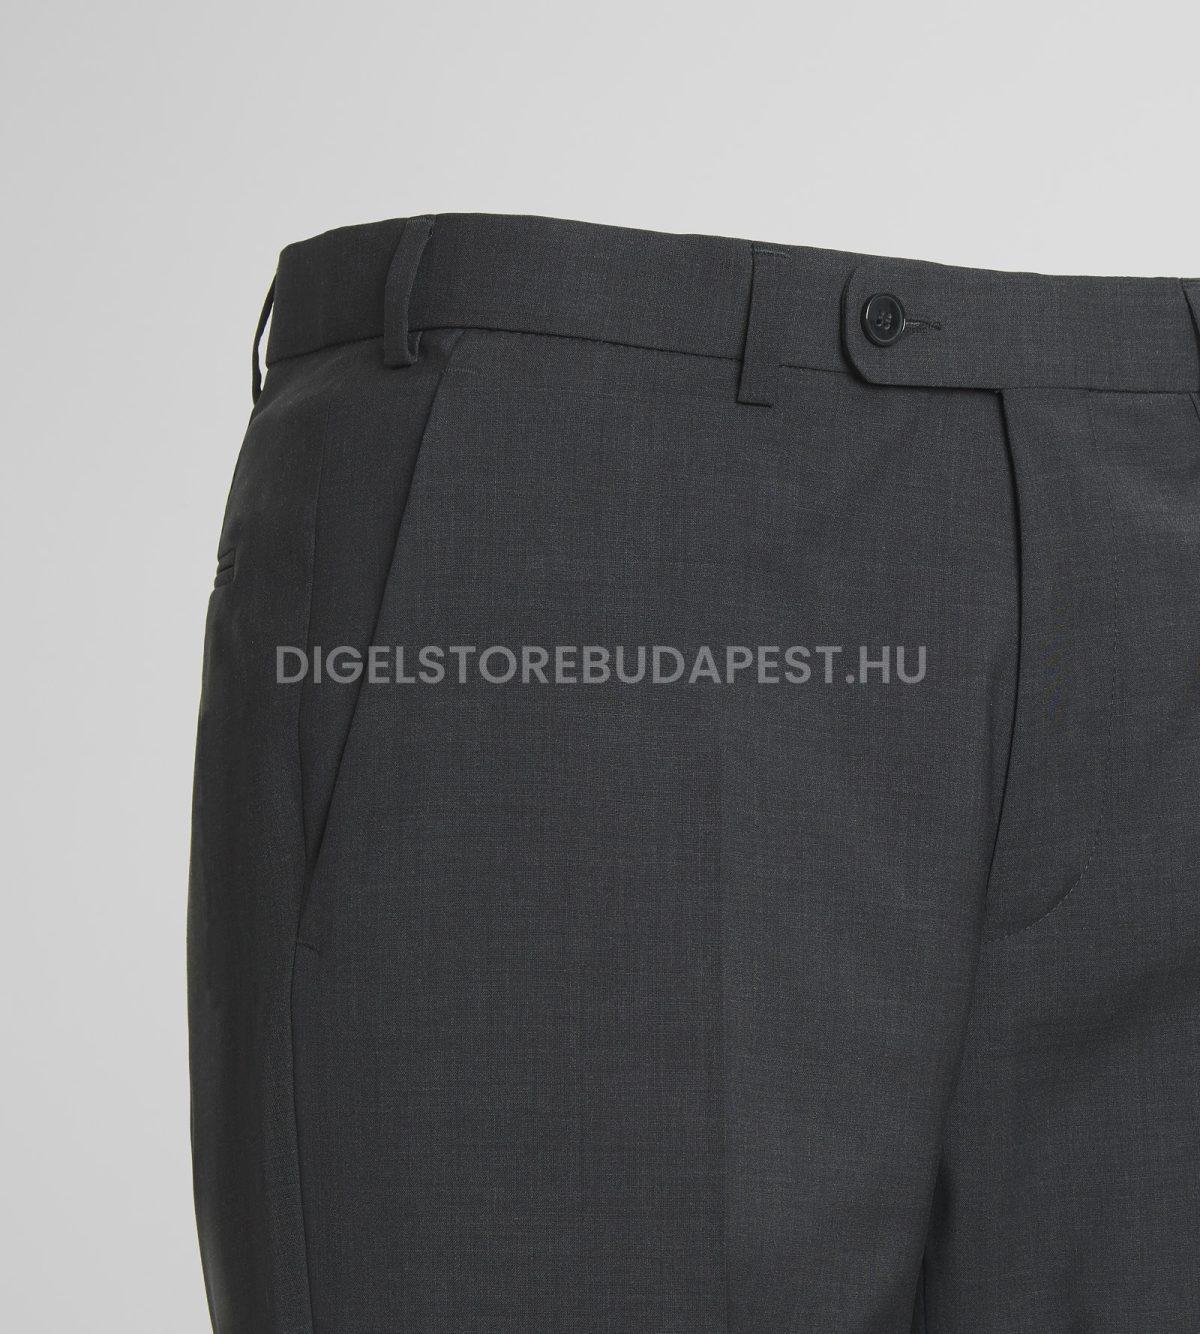 preference-sotetszurke-modern-fit-strukturalt-tiszta-gyapju-szovetnadrag-per-99832-42